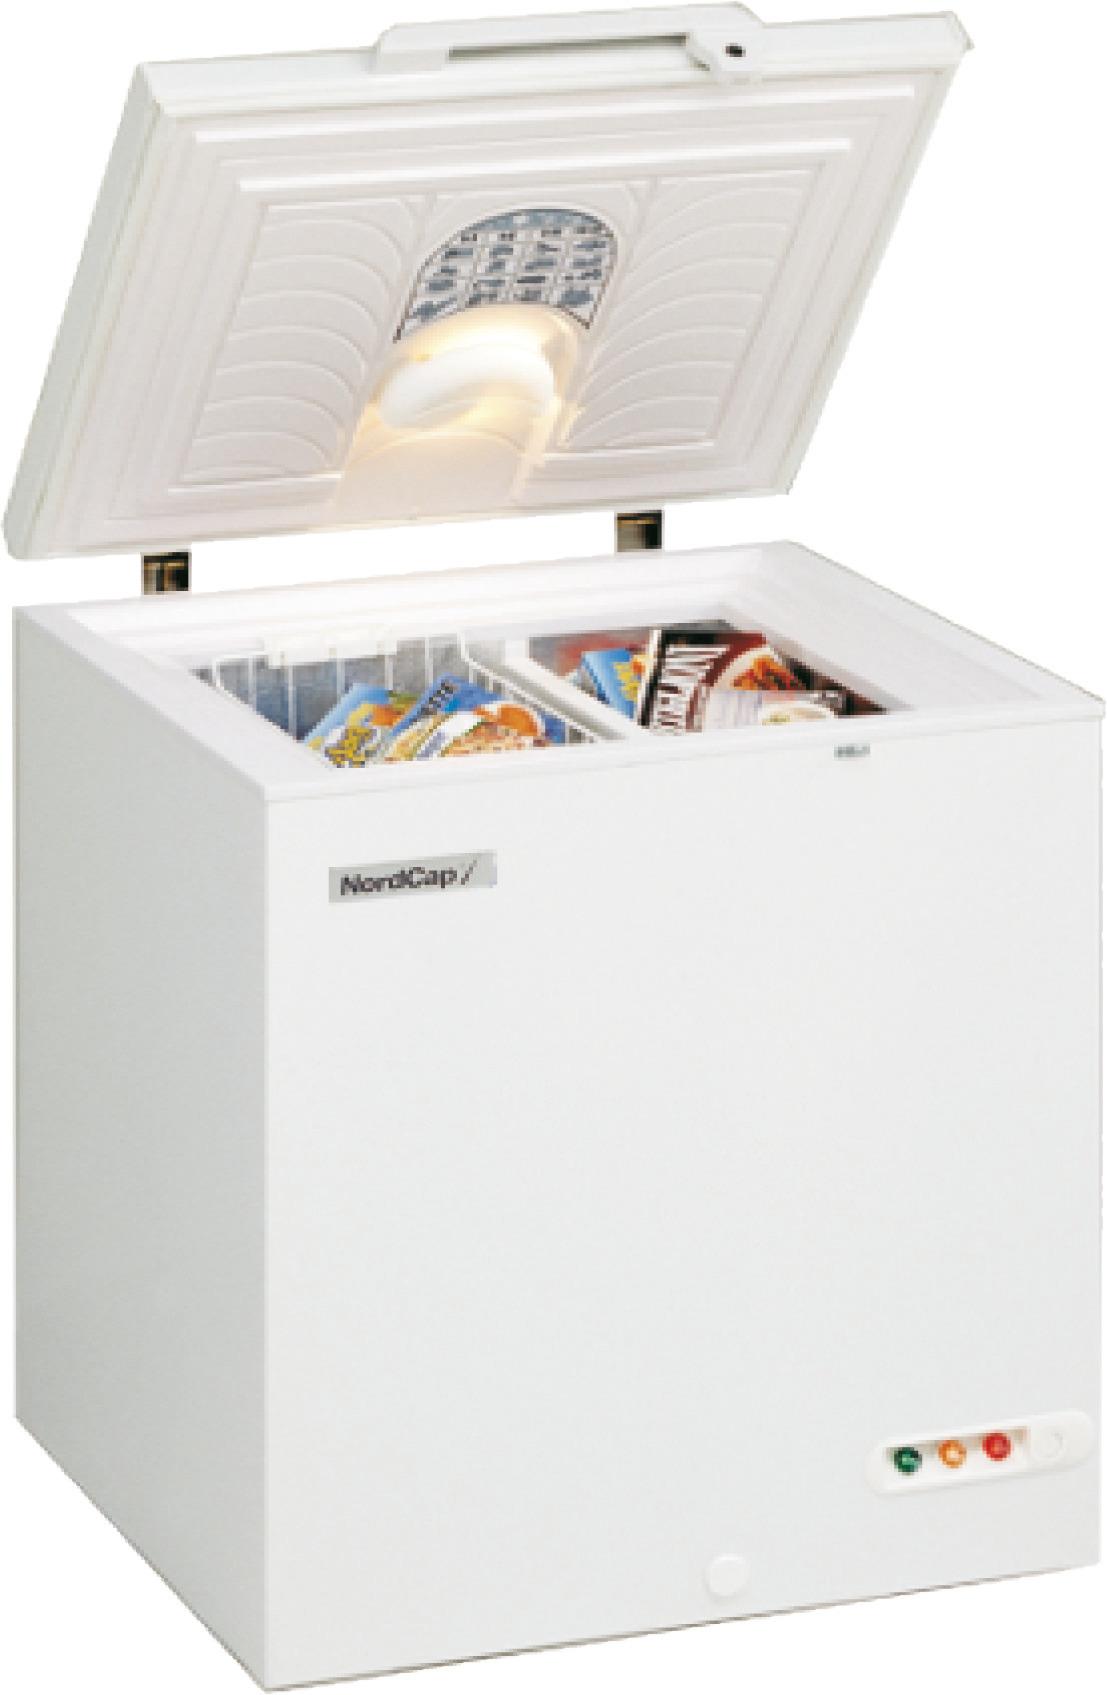 Energiespar-Tiefkühltruhe 130,00 l /  für 1 Korb / steckerfertig